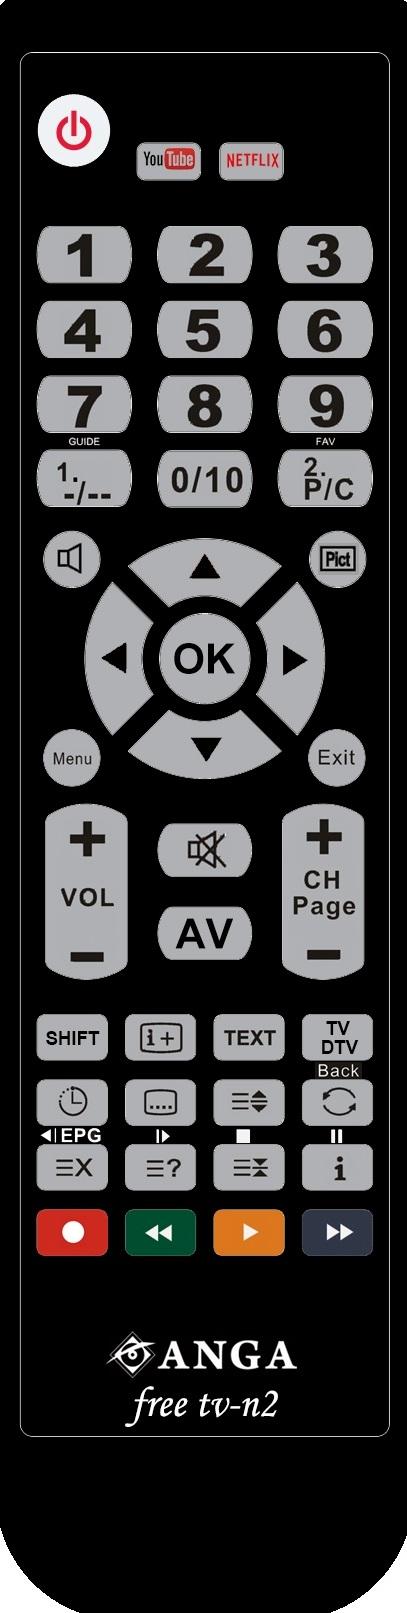 Free TV-N2 (Polybag) προγραμματιζόμενο με USB+IR Τηλεχειριστήριο ANGA